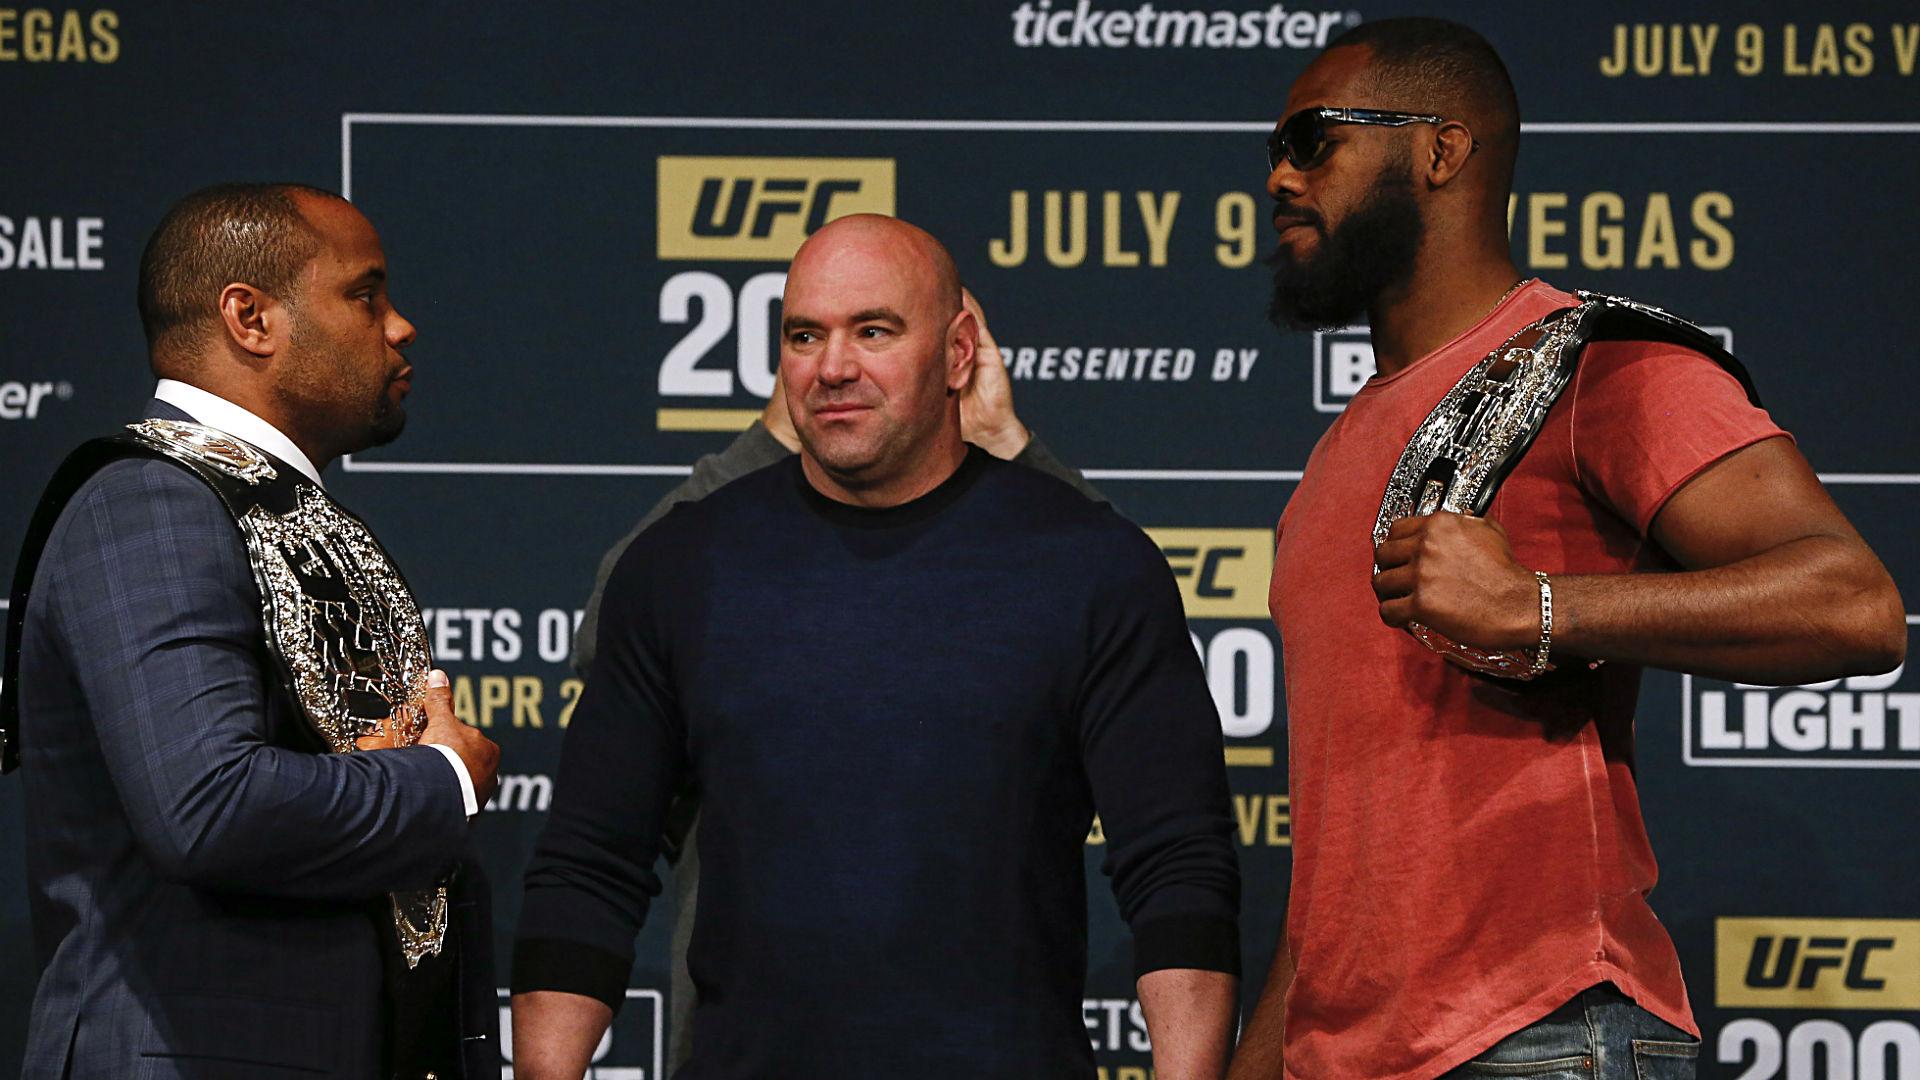 UFC 214 fight card: Jones vs. Cormier 2 date, time, PPV price